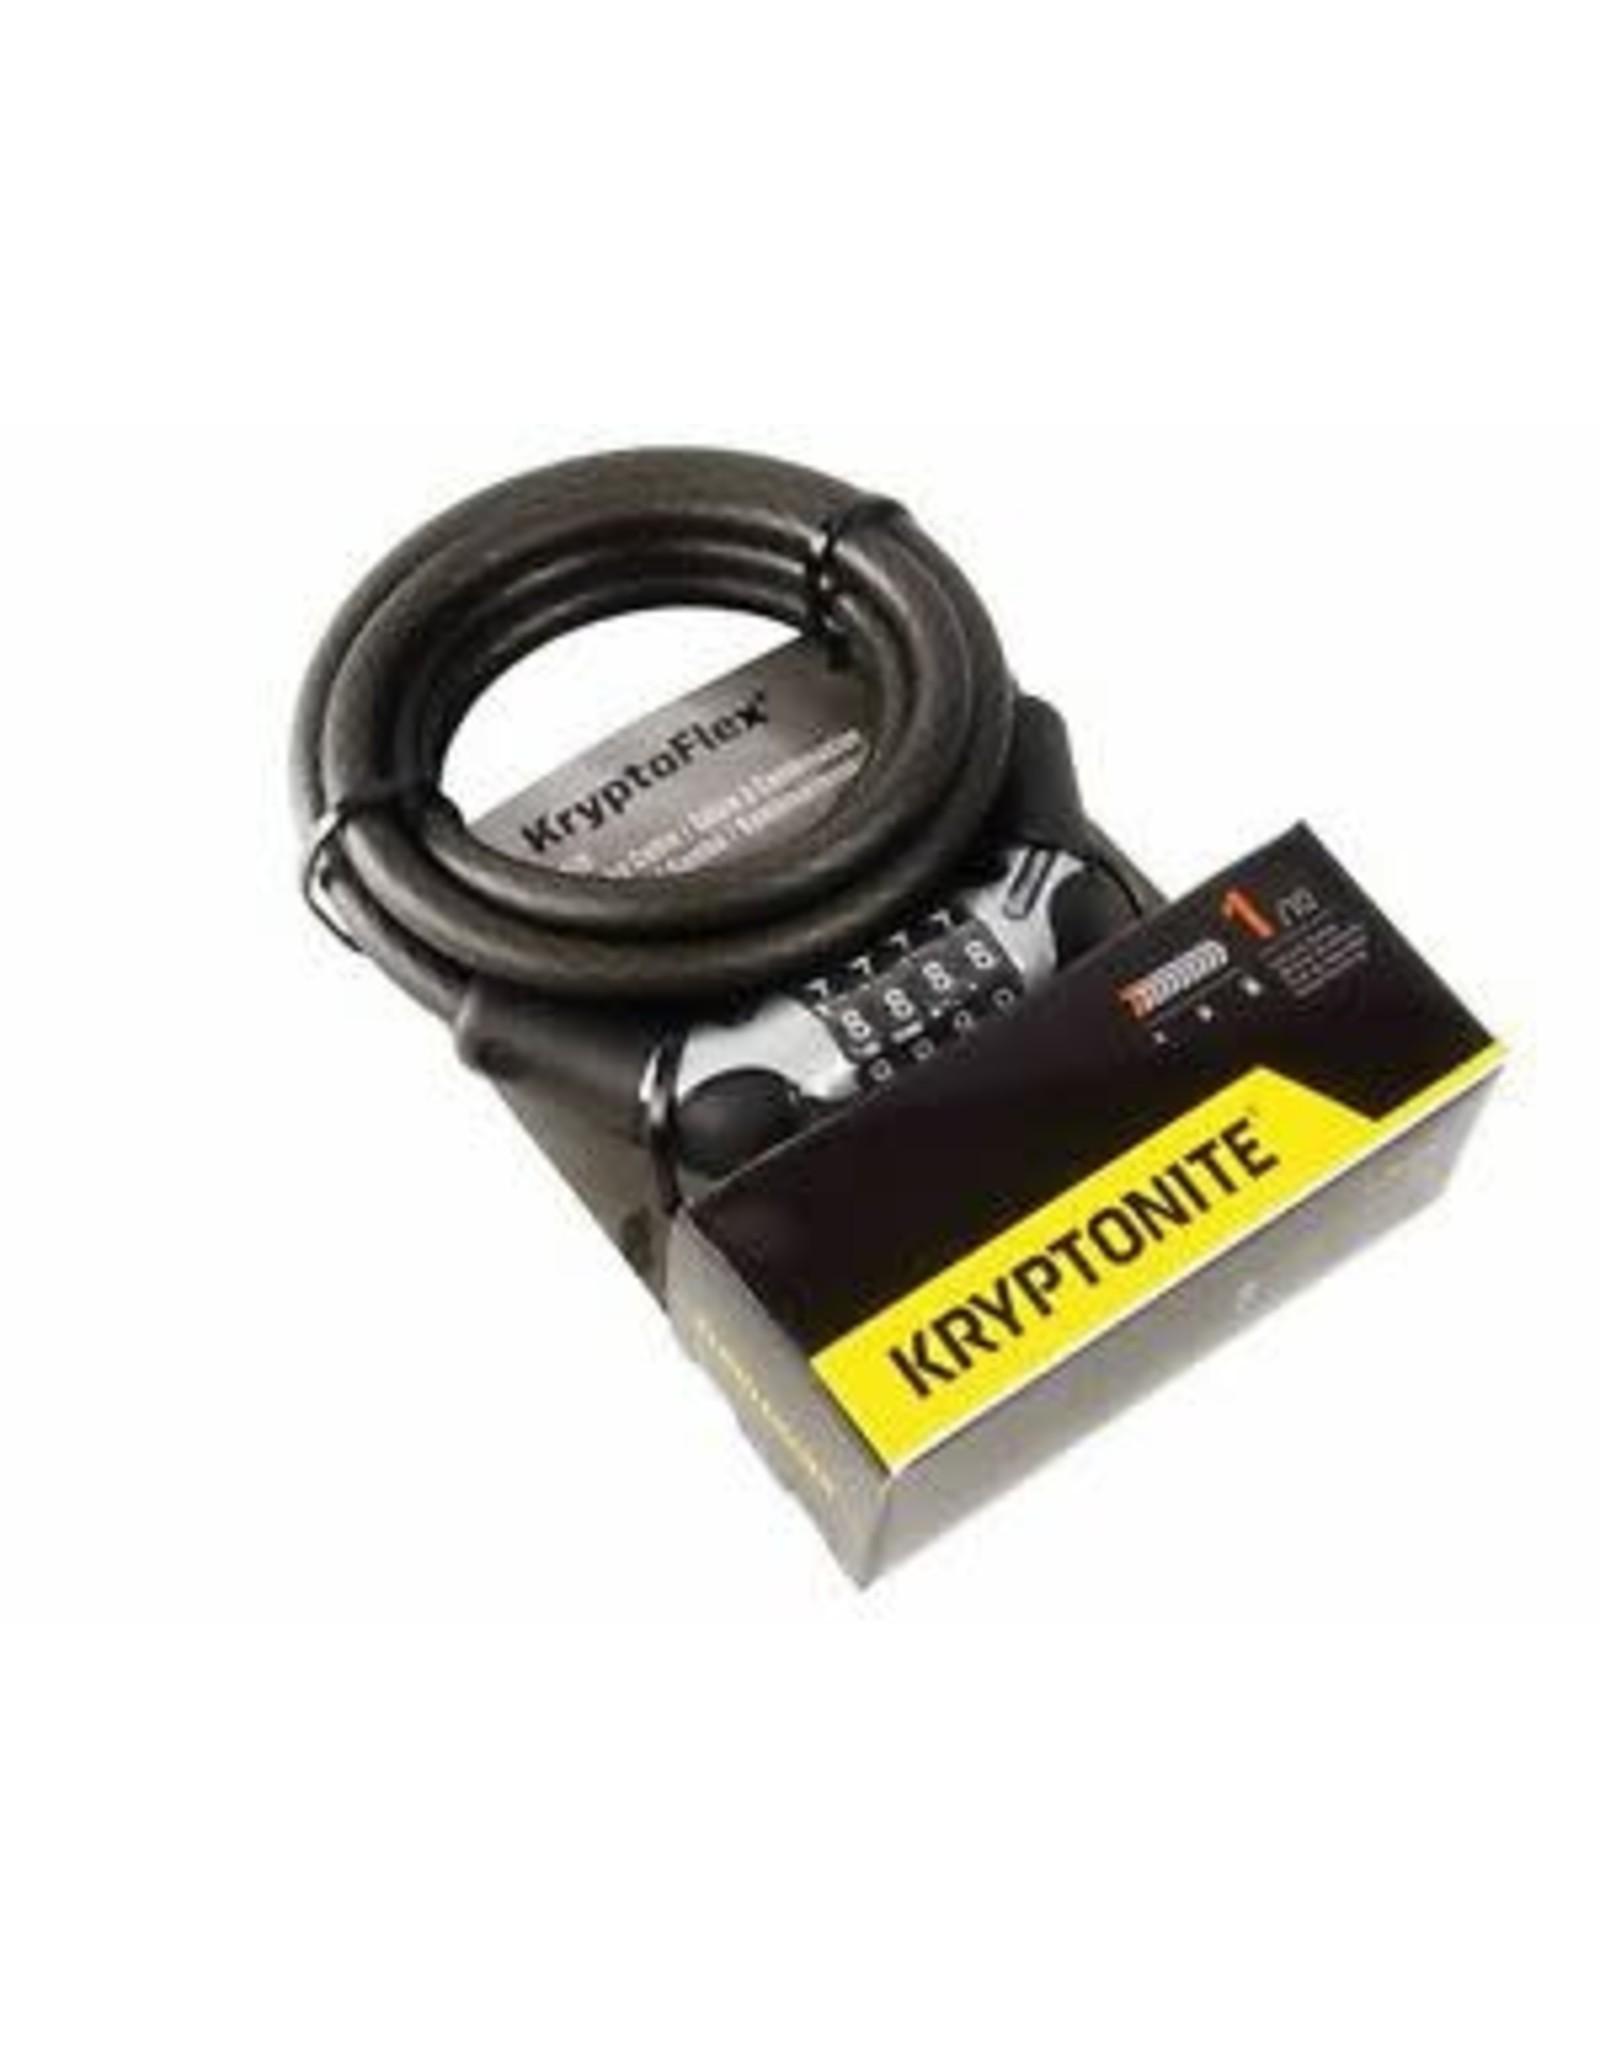 KRYPTOFLEX 1018 COMBO CABLE LOCK